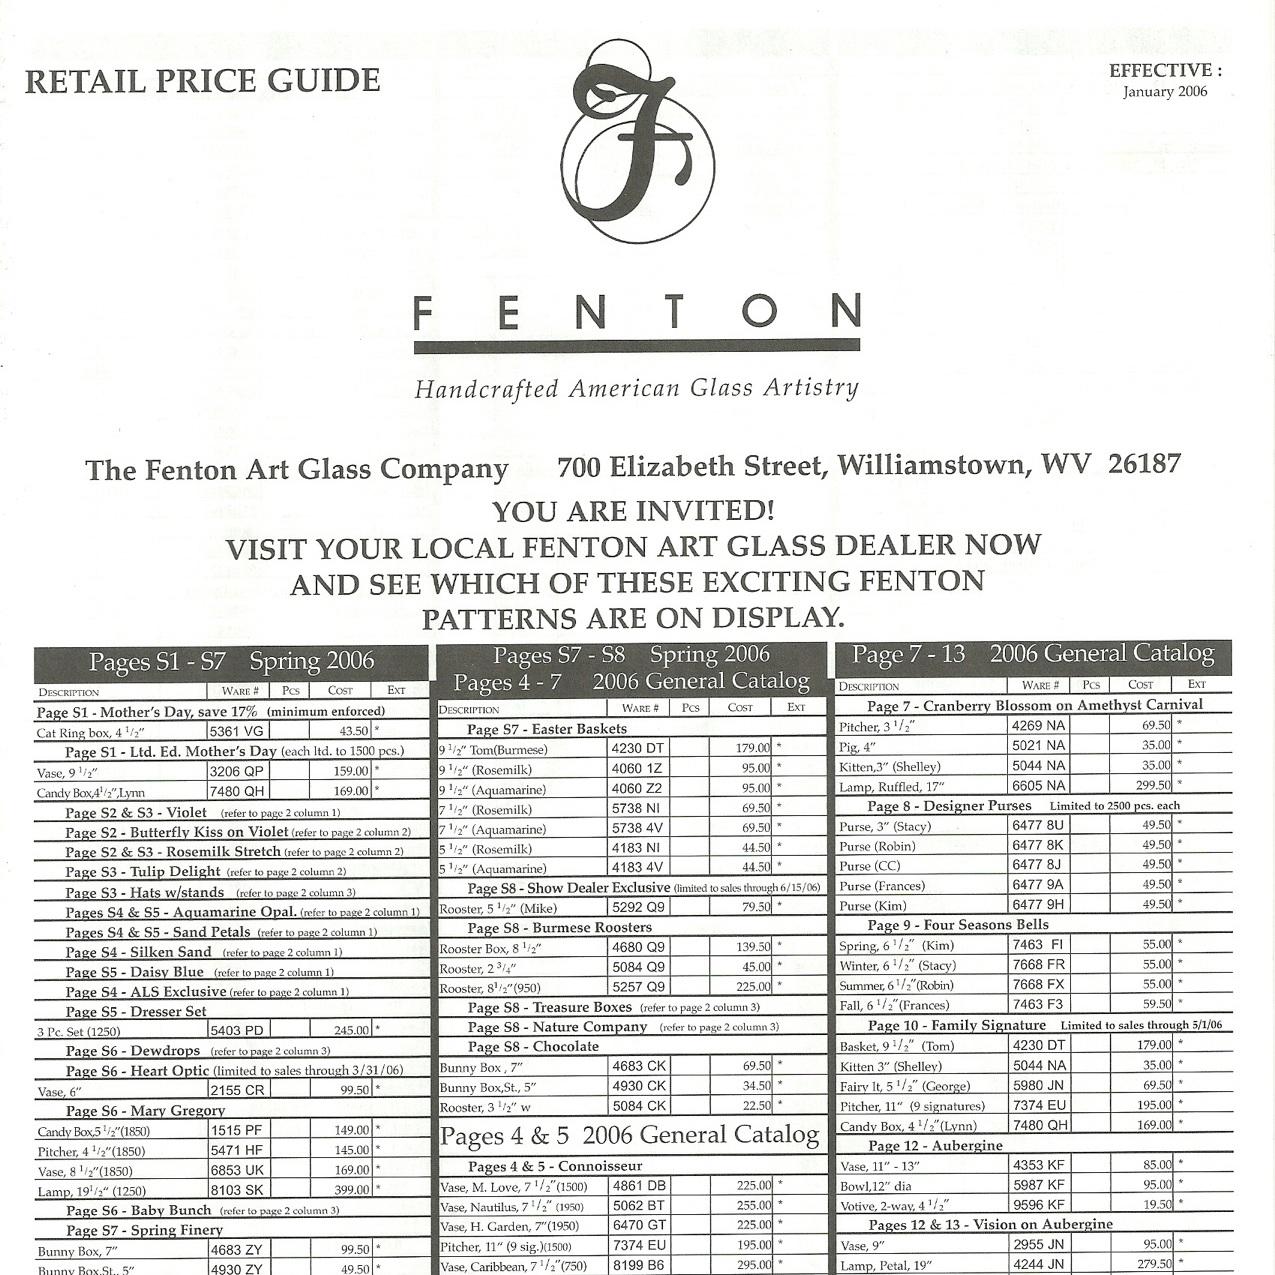 2006 Jan Price Guide